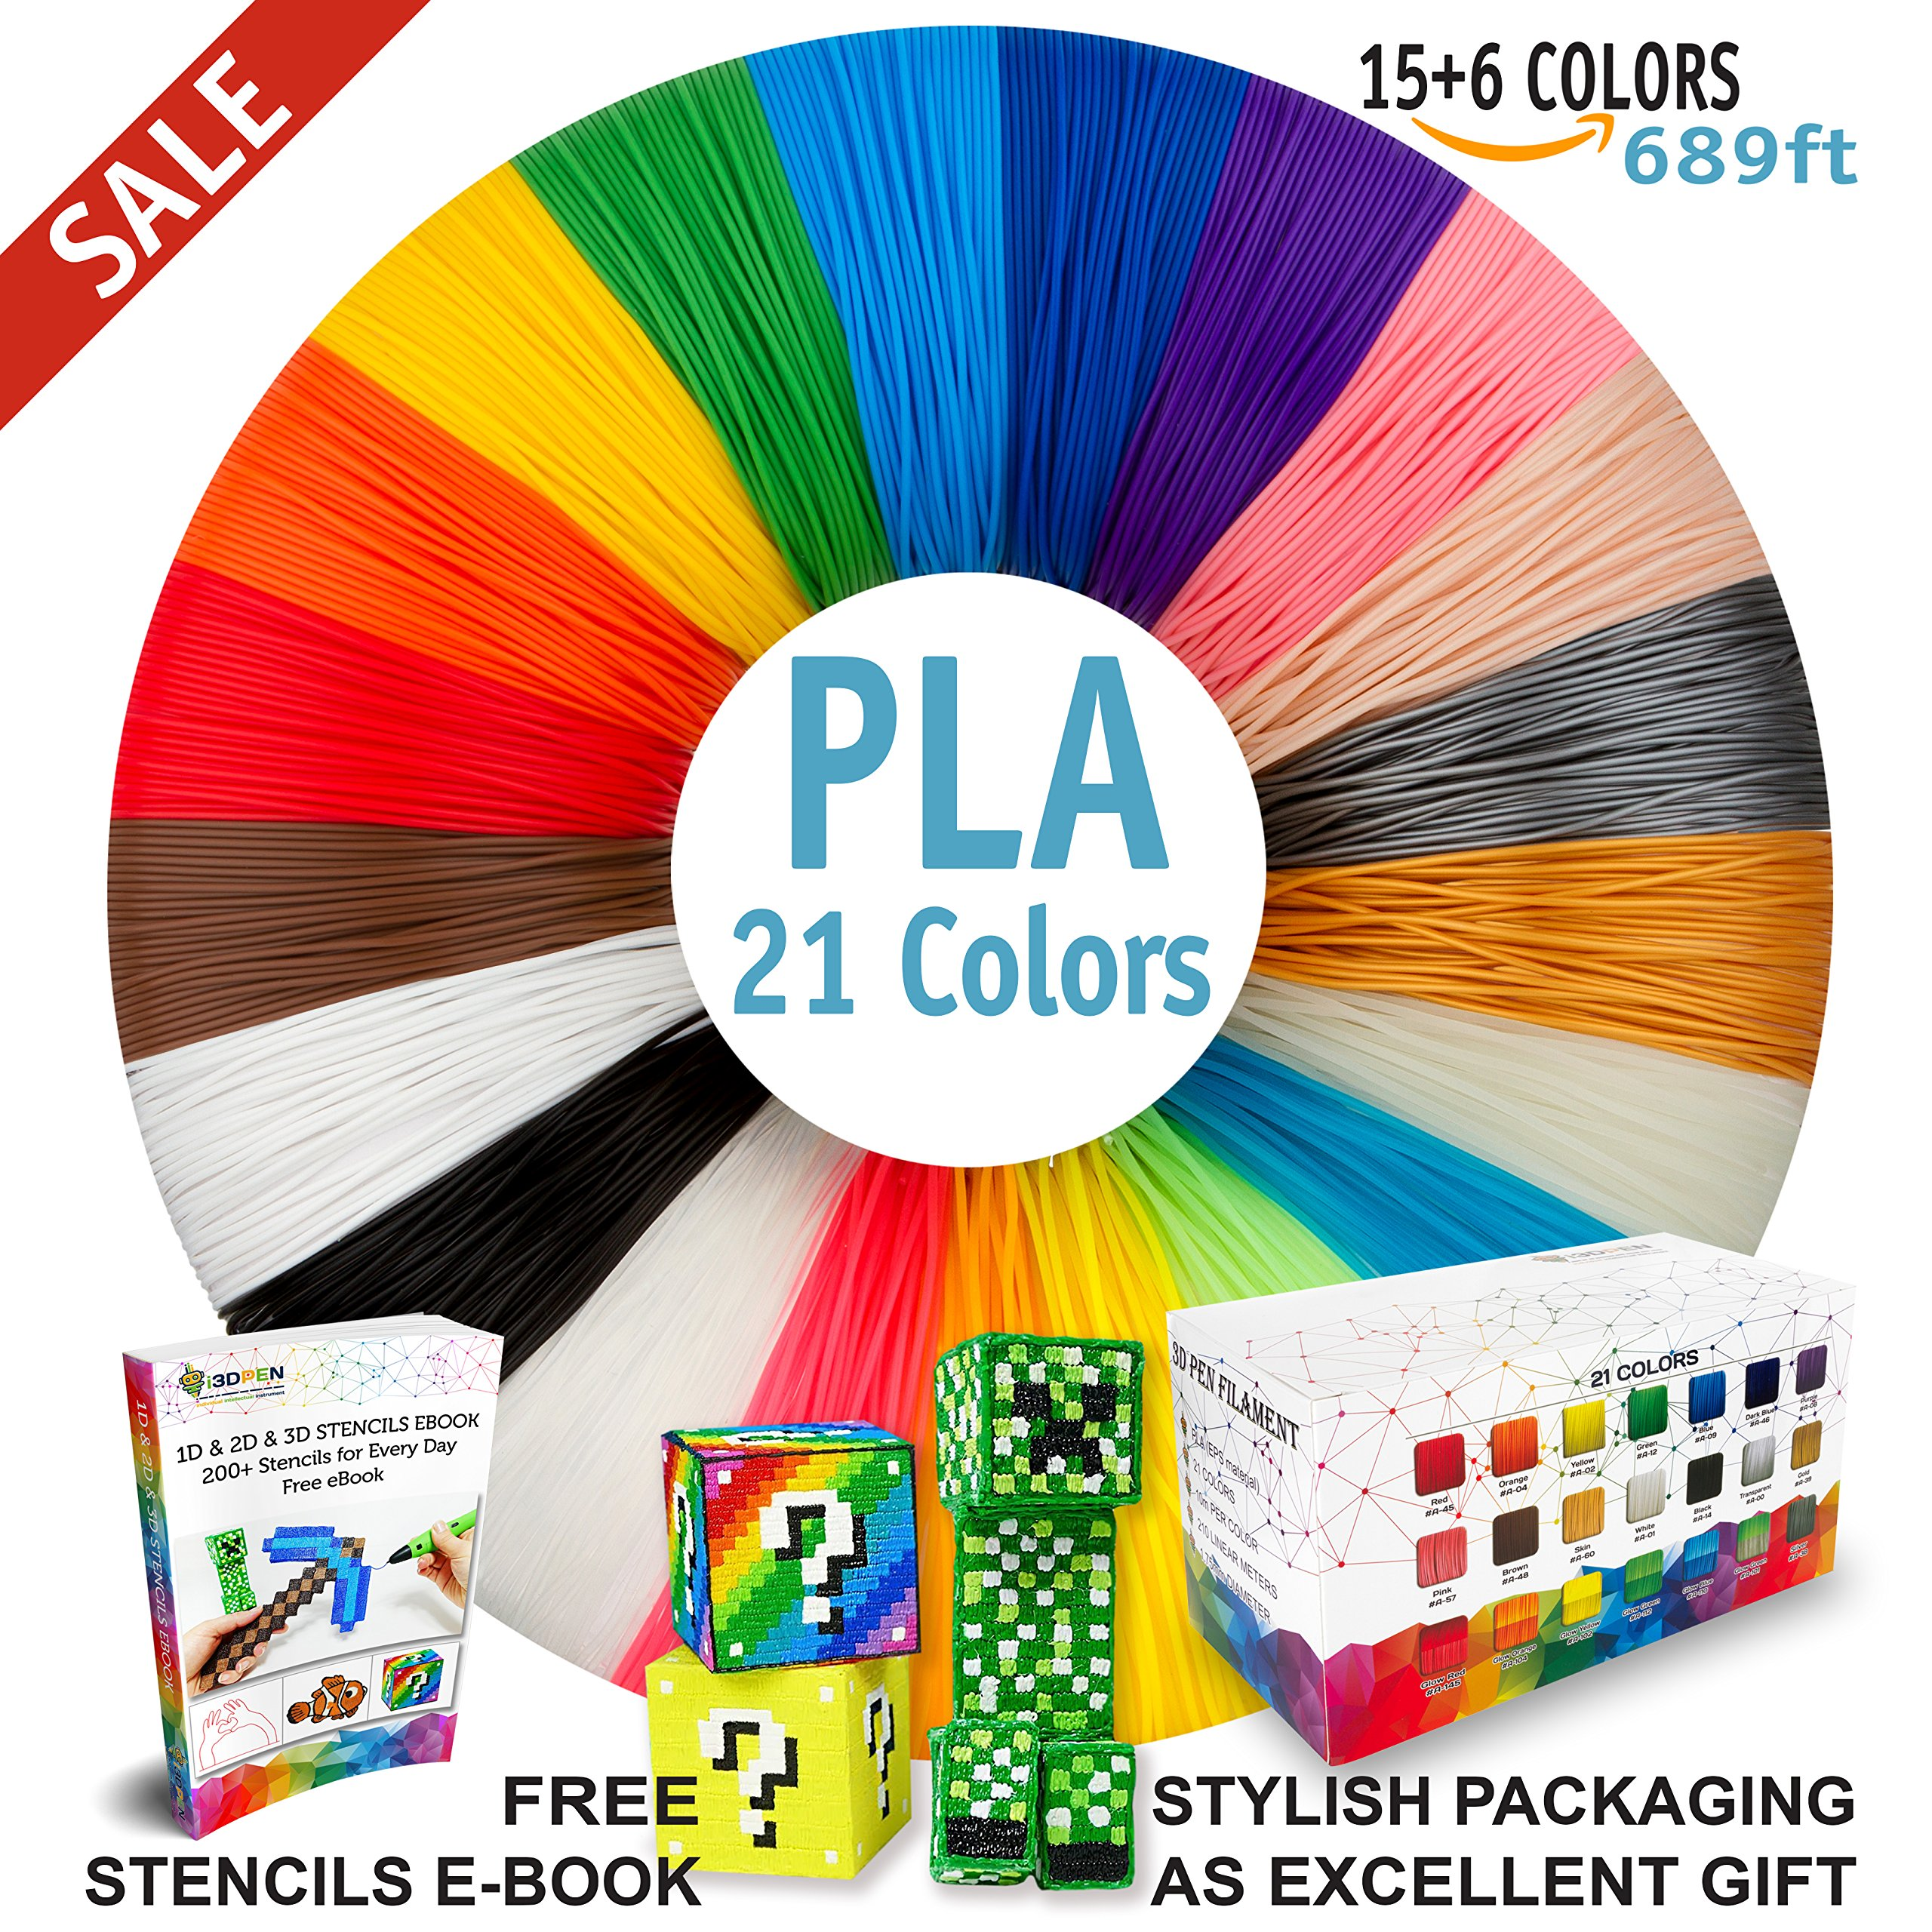 3D Pen Filament Refills - Premium Set of 21 Colors 689ft Bonus 200 Stencils EBook including 6 Glow in the Dark - Best 1.75mm PLA Filament Pack for 3D Pens by i3DPen